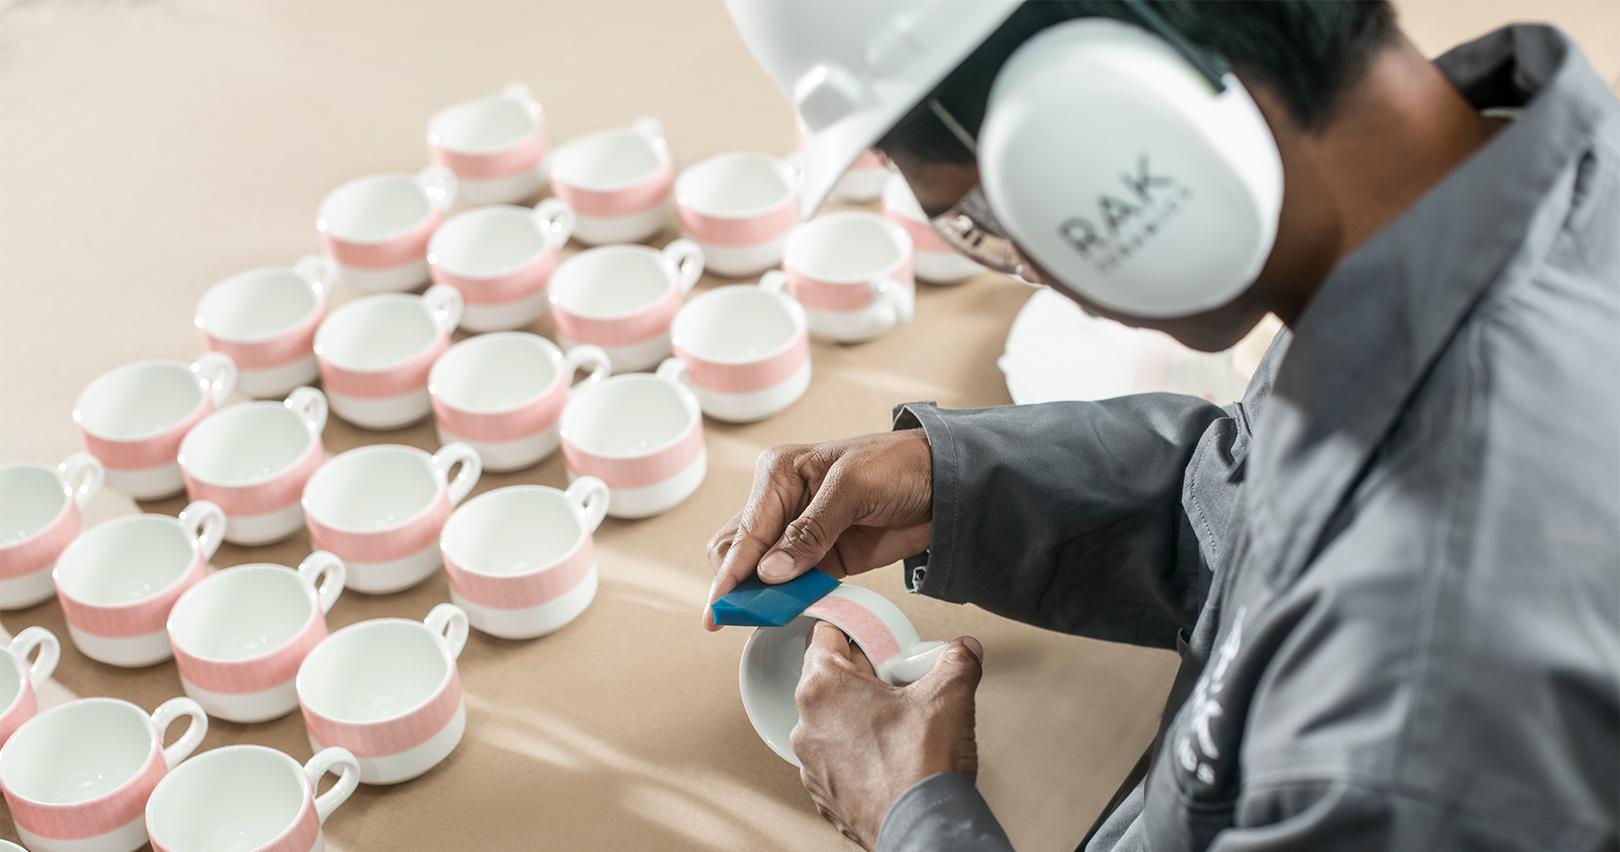 RAK Ceramics (Bangladesh) to present at investor conference